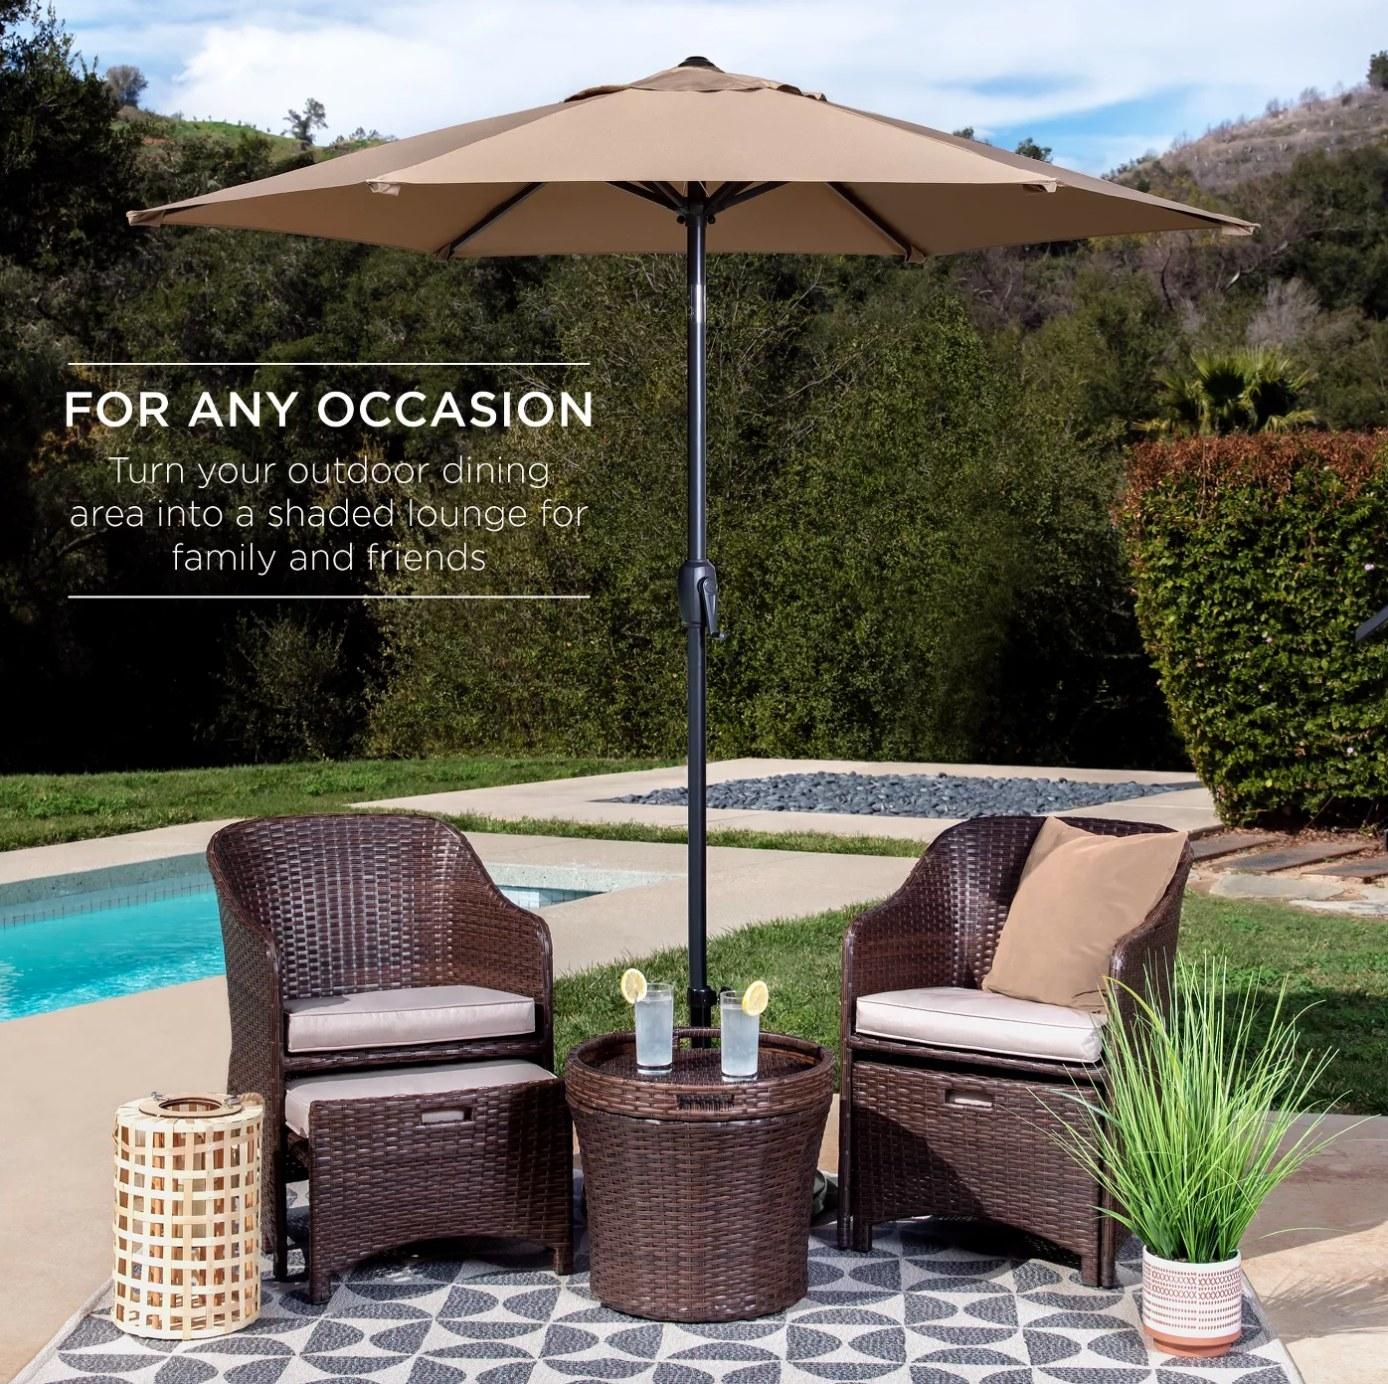 The patio umbrella in tan